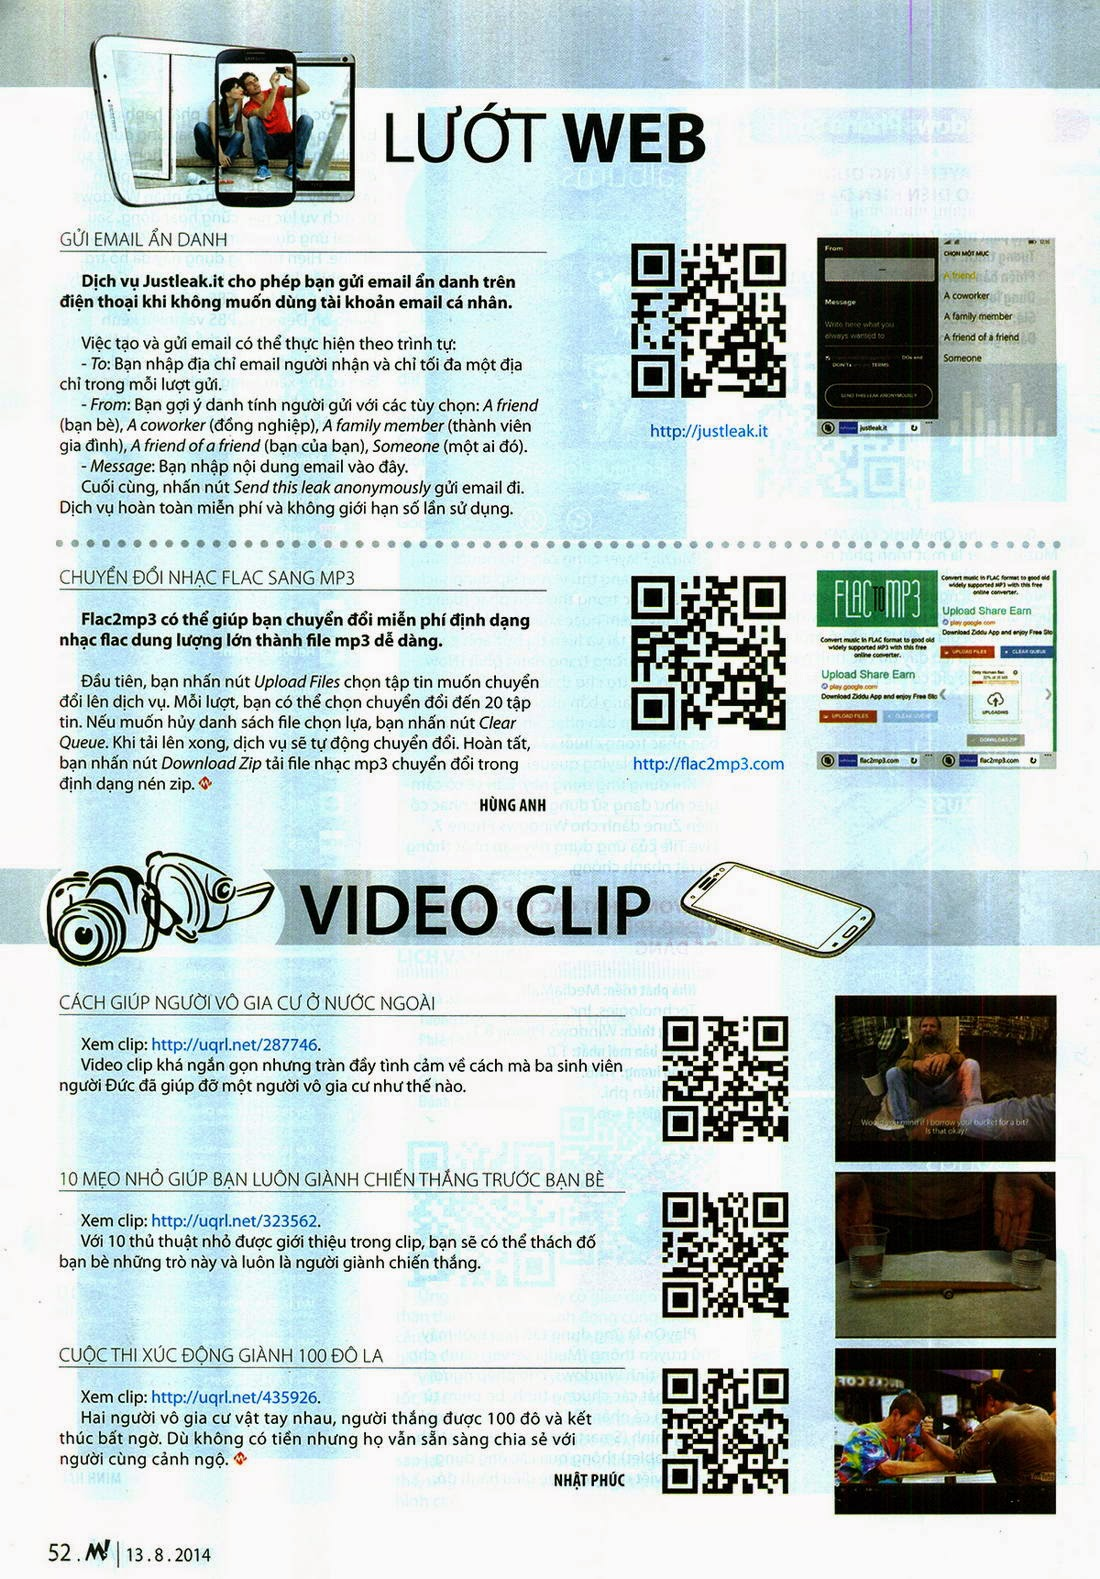 EChip Mobile 465 - tapchicntt.com